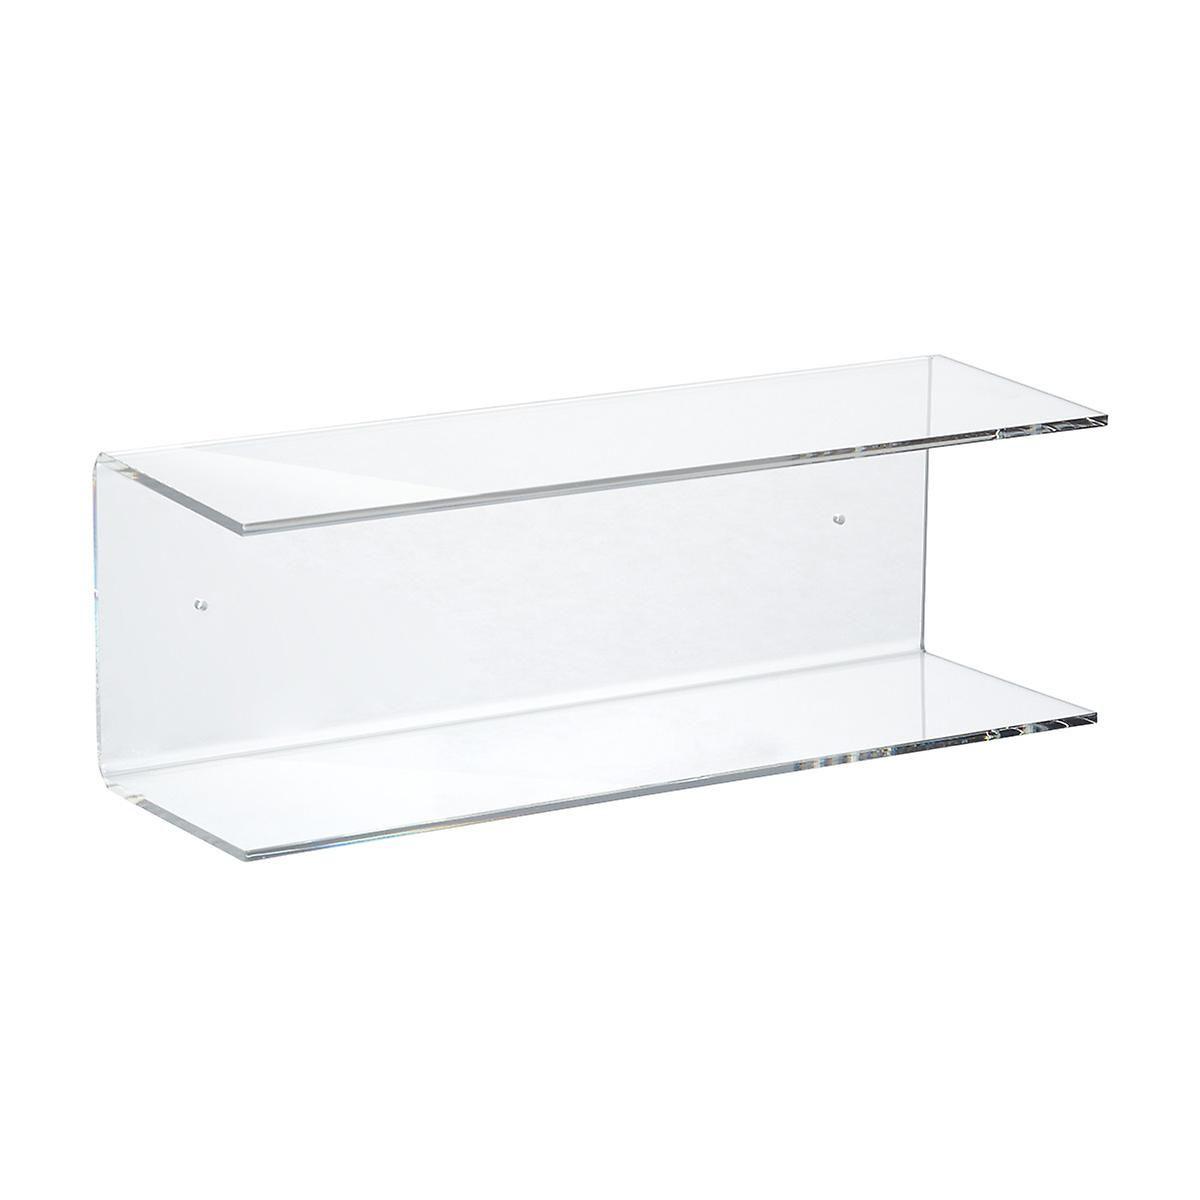 Double Acrylic Wall Shelf Acrylic Wall Shelf Acrylic Shelf Wall Shelves